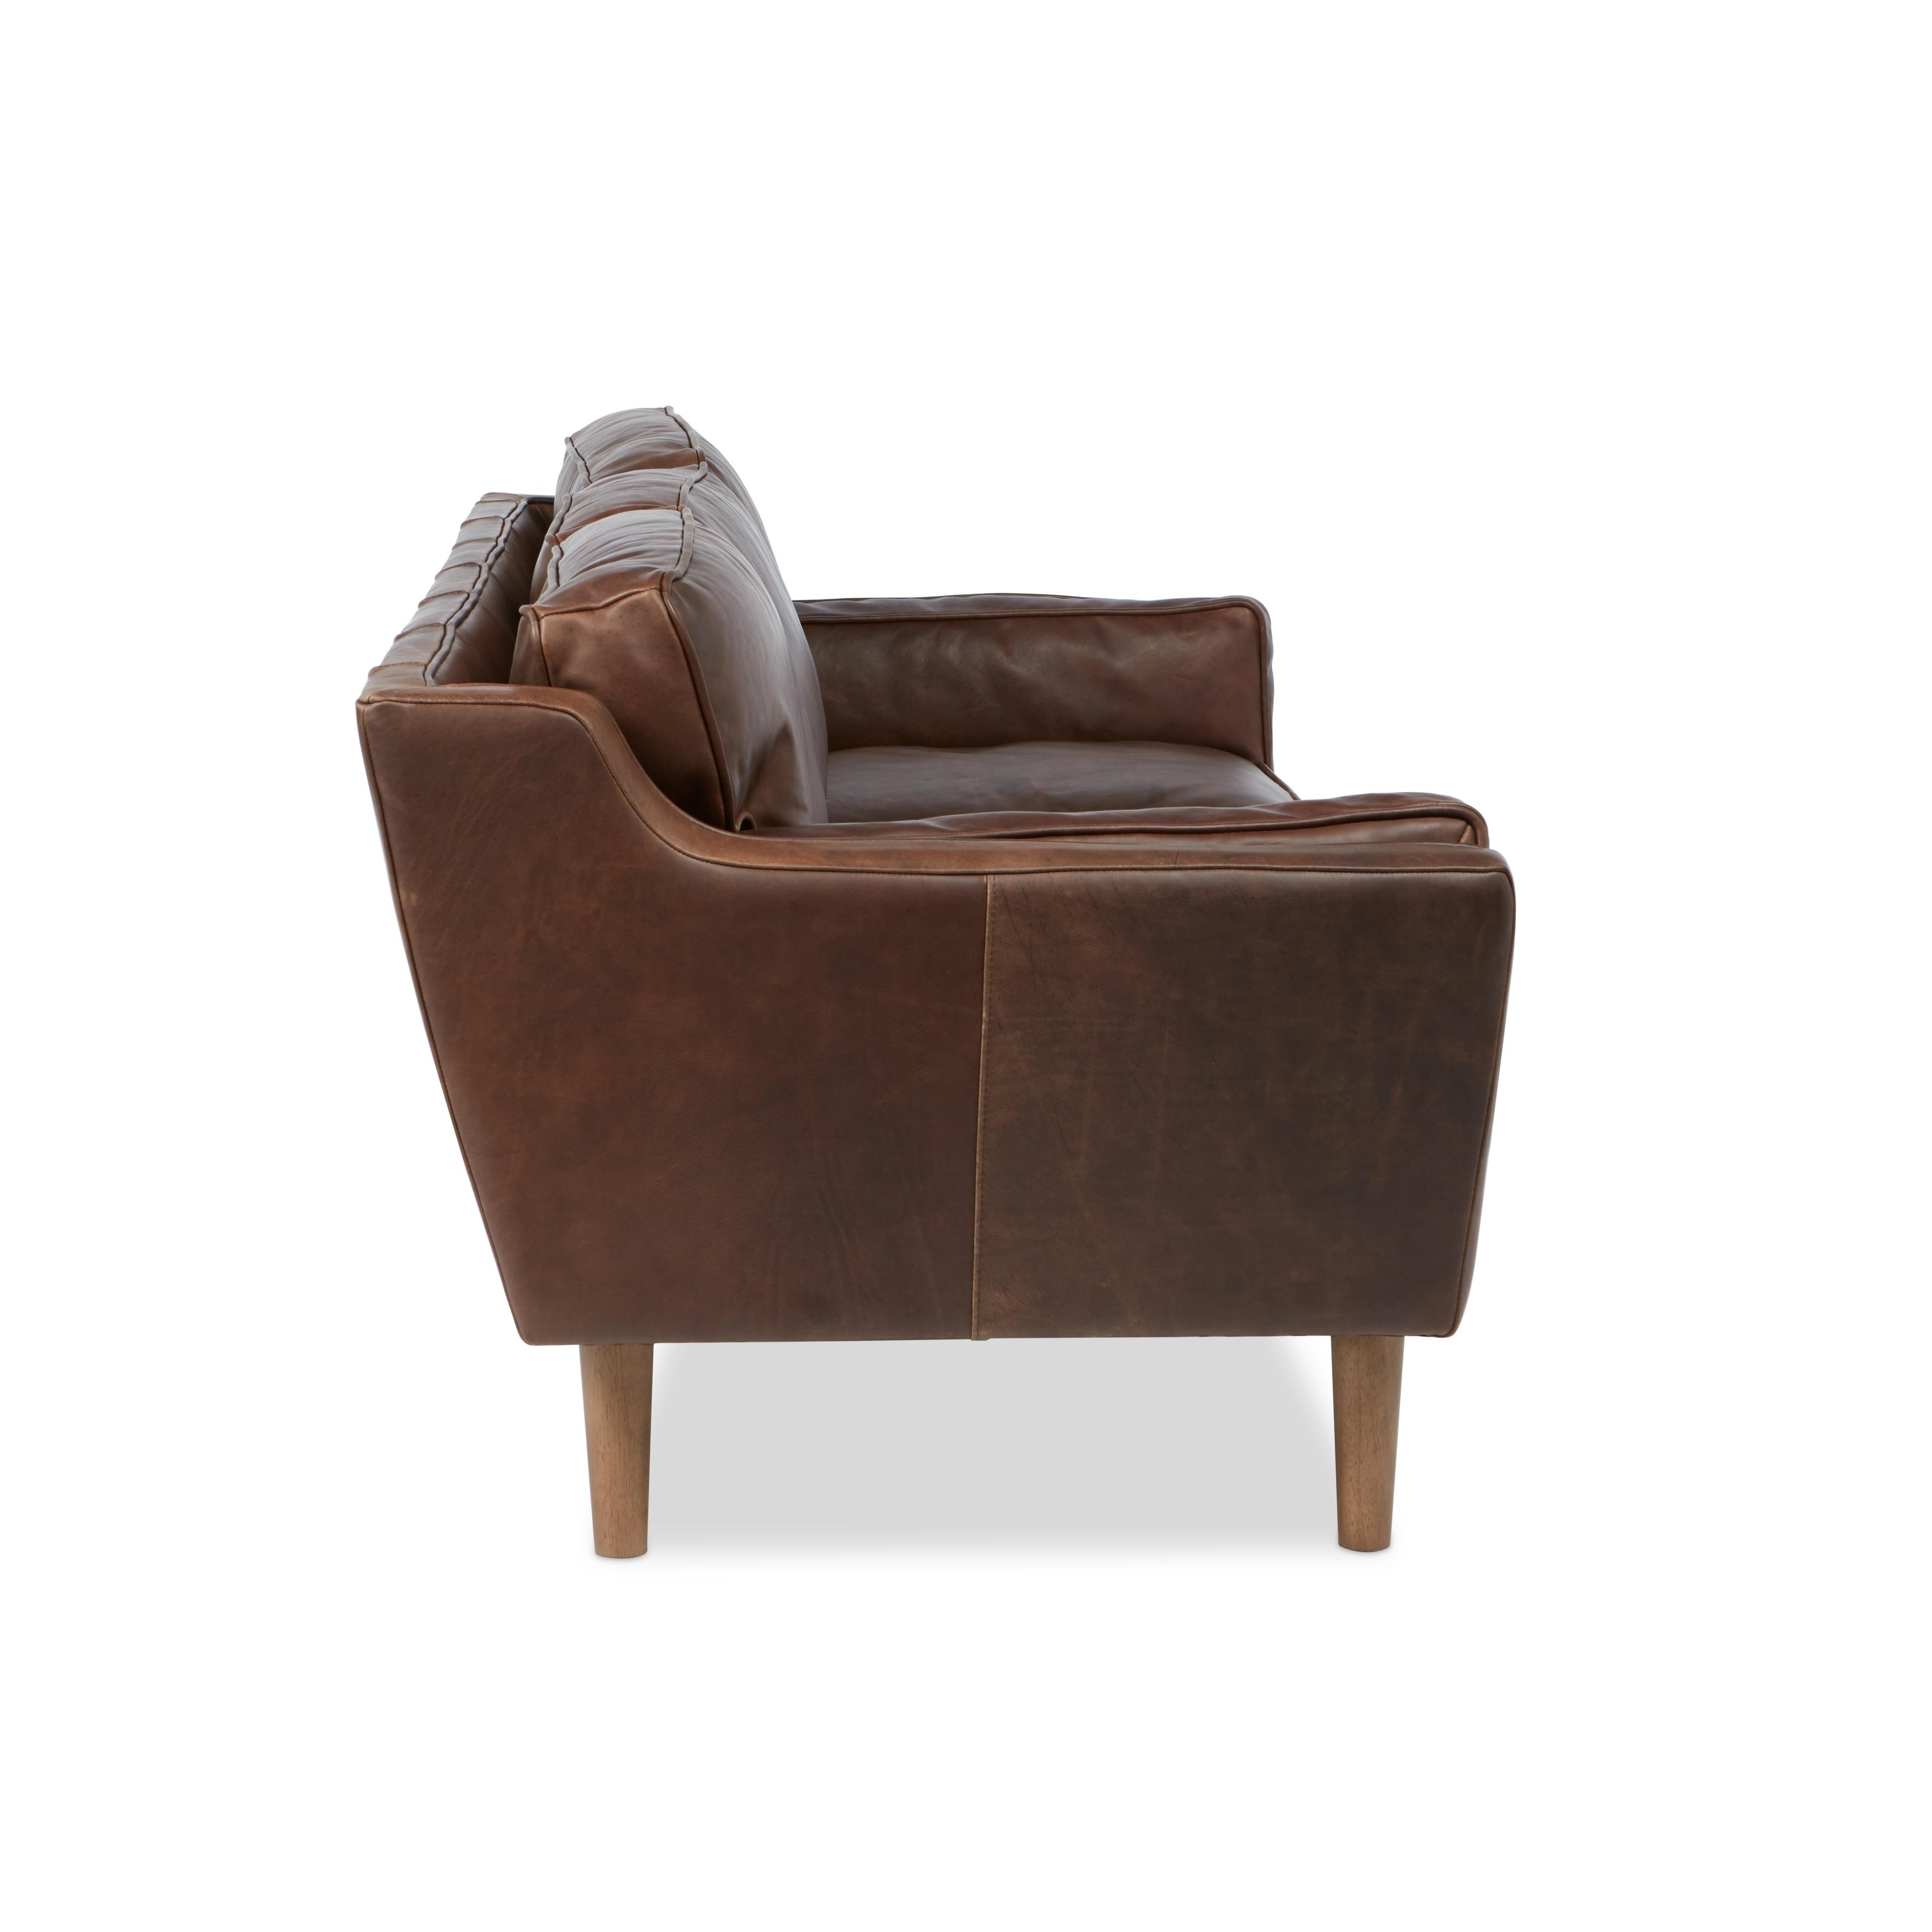 Jasper Laine Beatnik Leather Sofa Columbus Chocolate Ships To Canada Ca 8494277